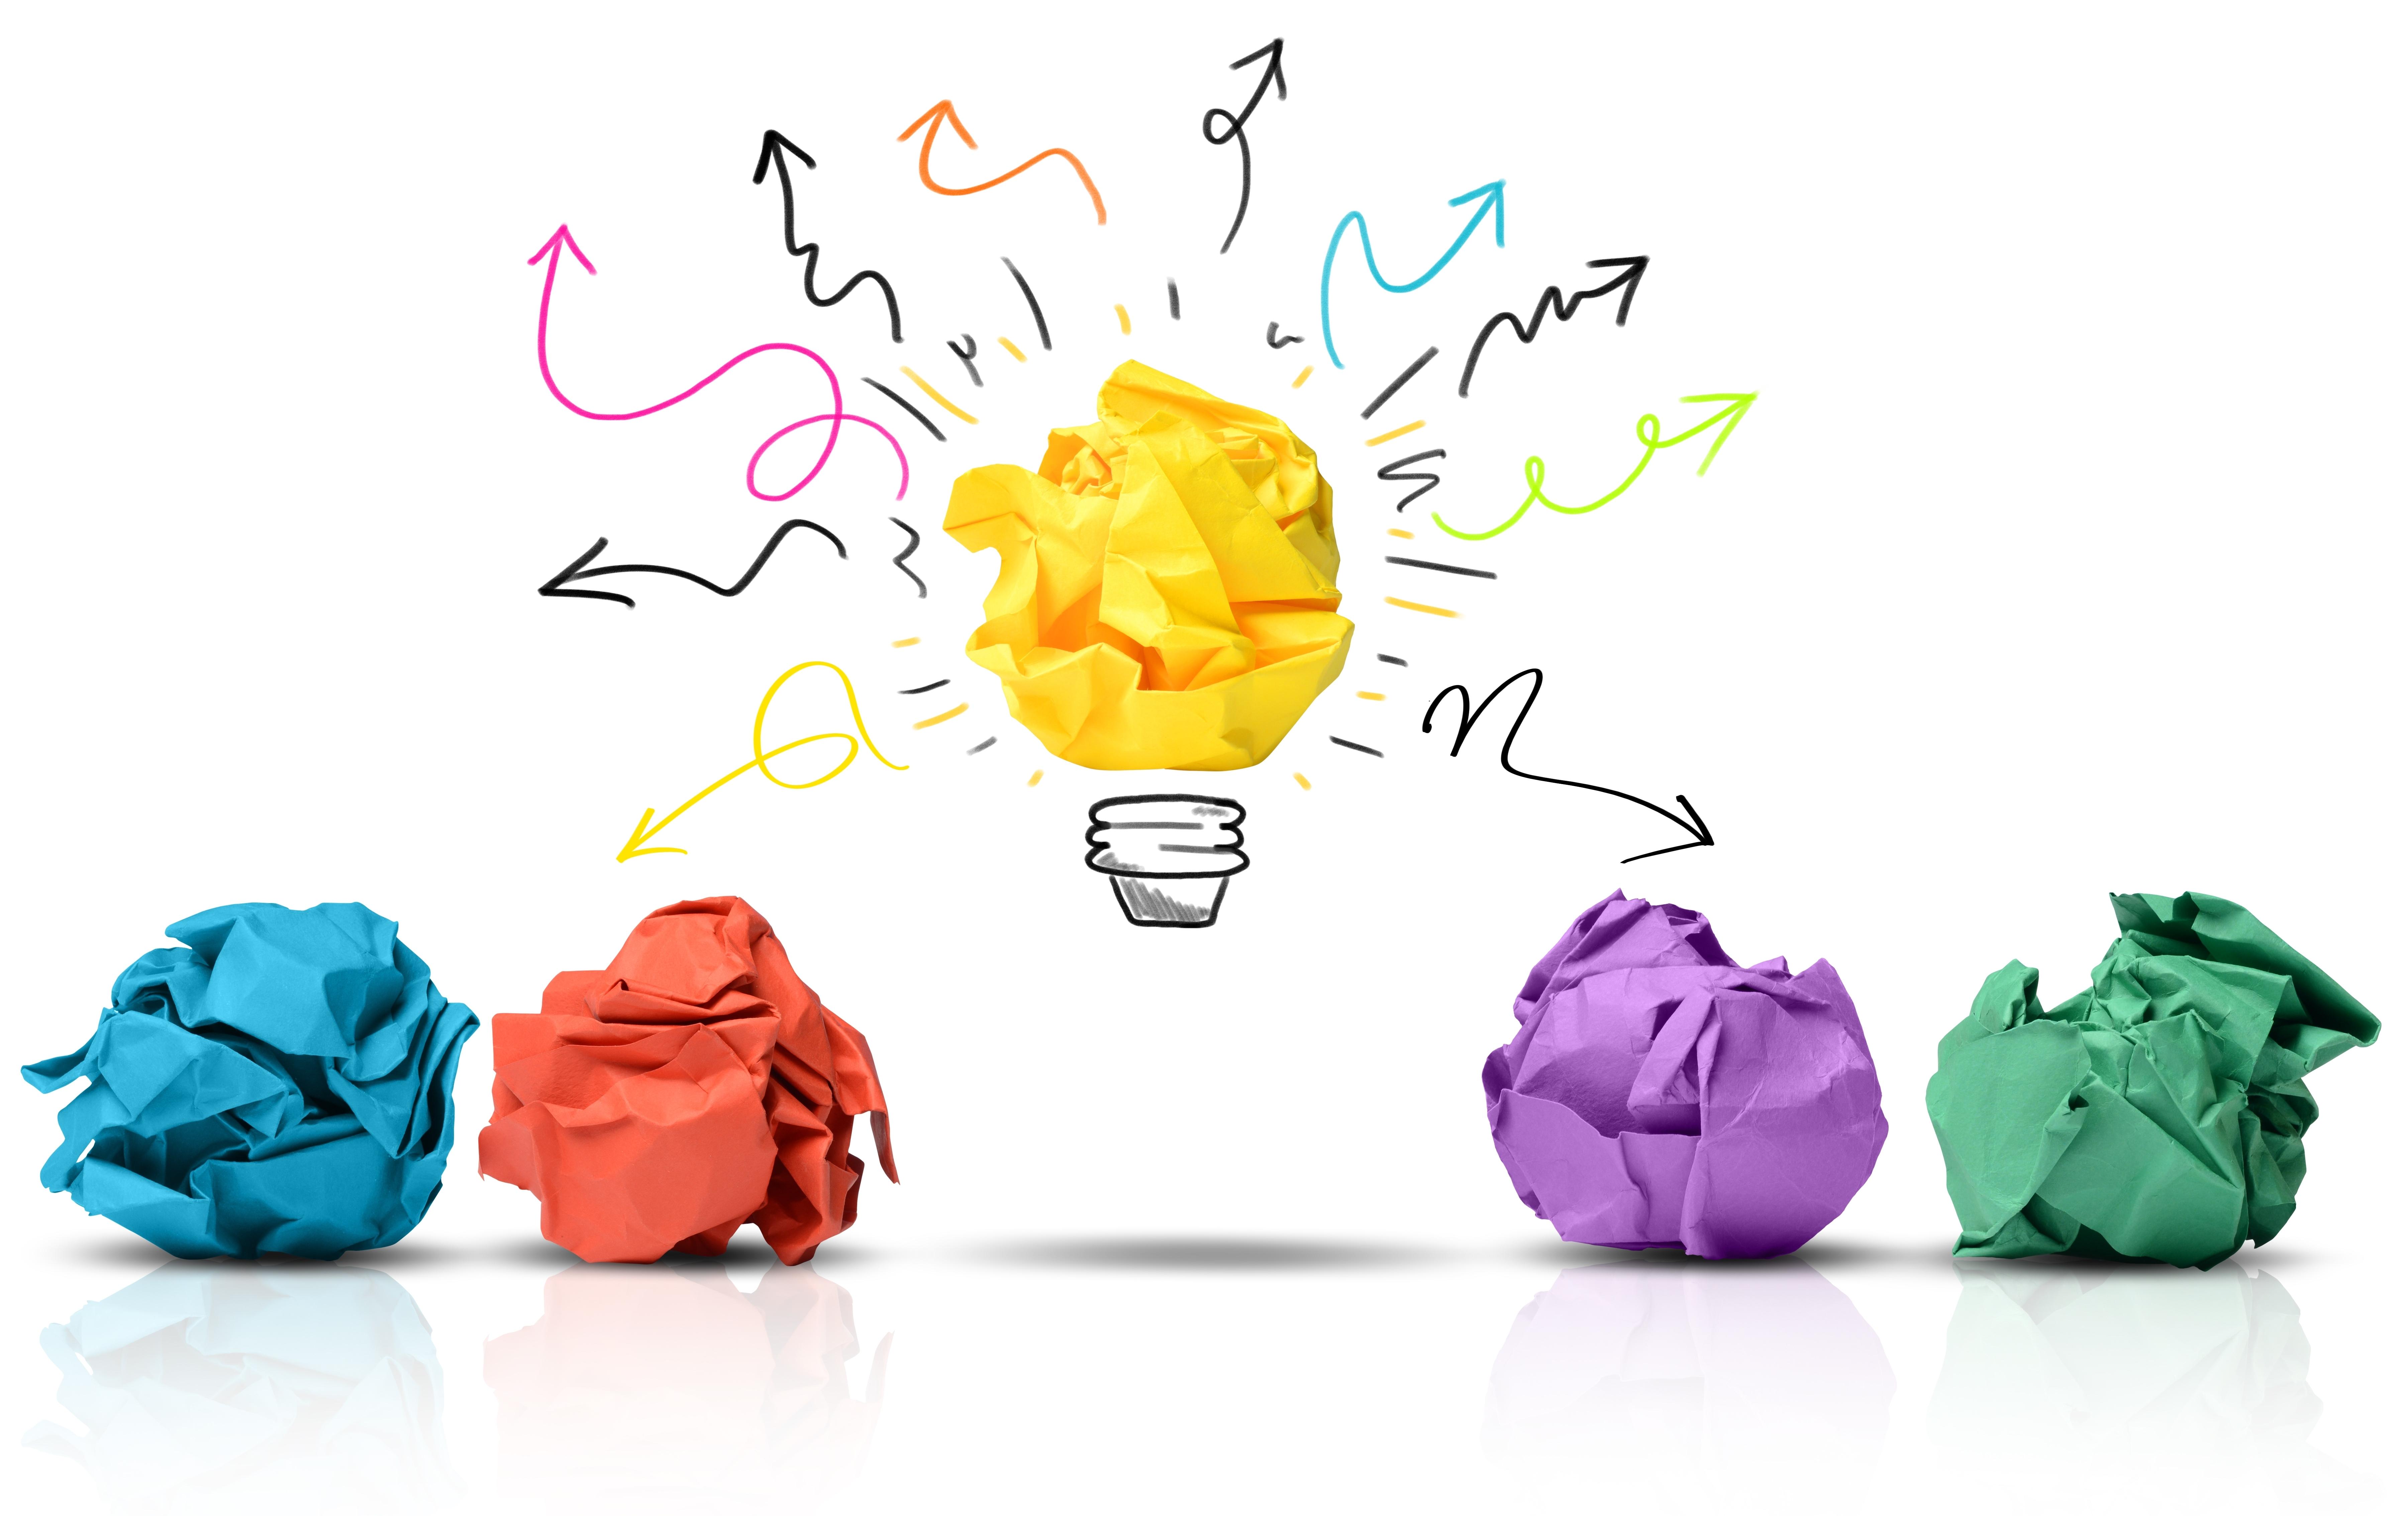 Project 21 Бизнес-План И Руководство По Маркетингу